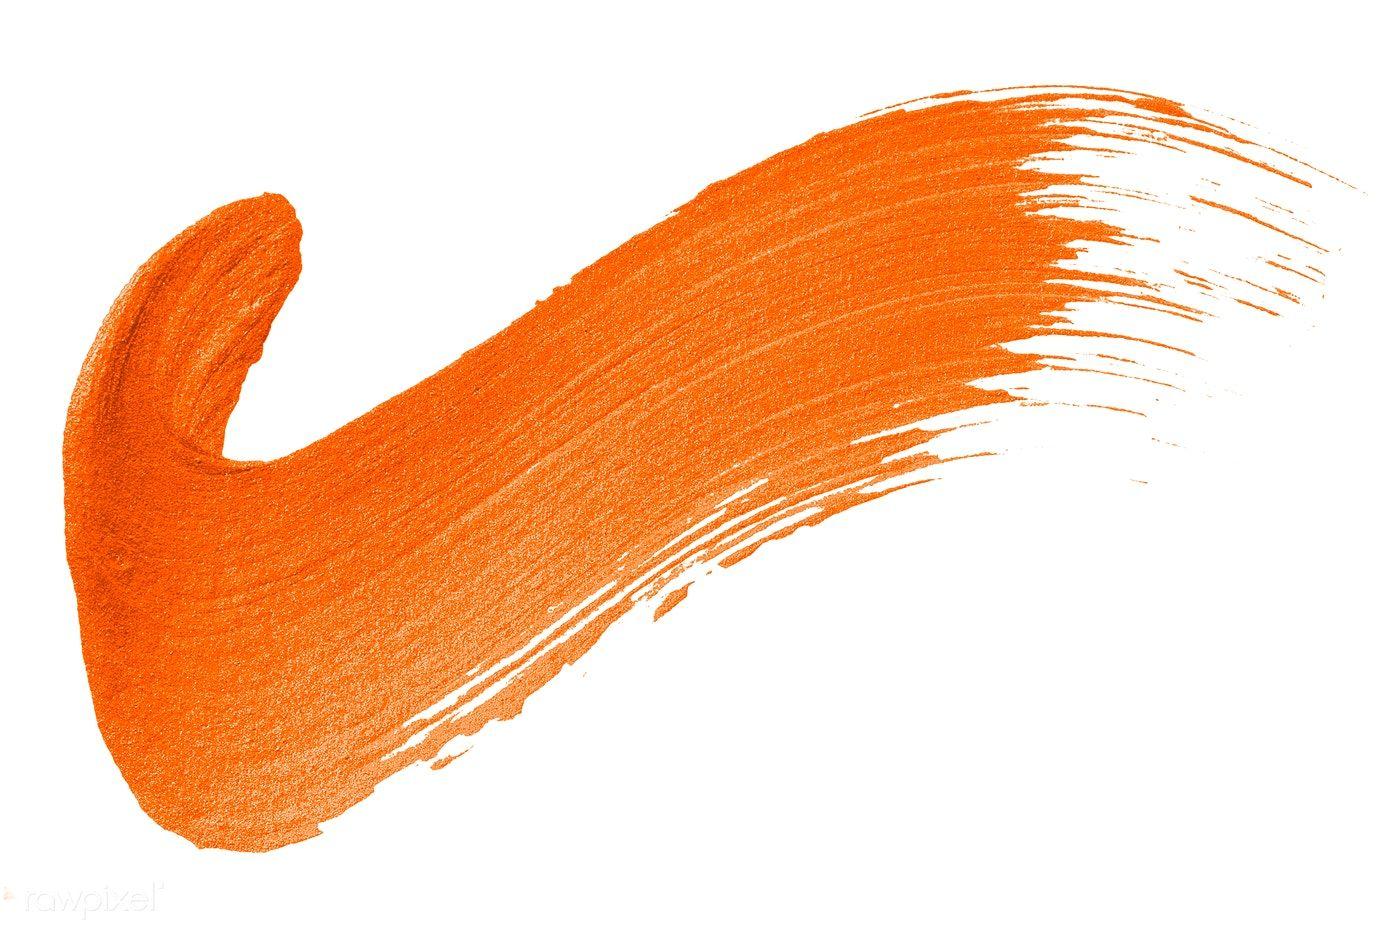 Tick Mark Shimmery Orange Brush Stroke Free Image By Rawpixel